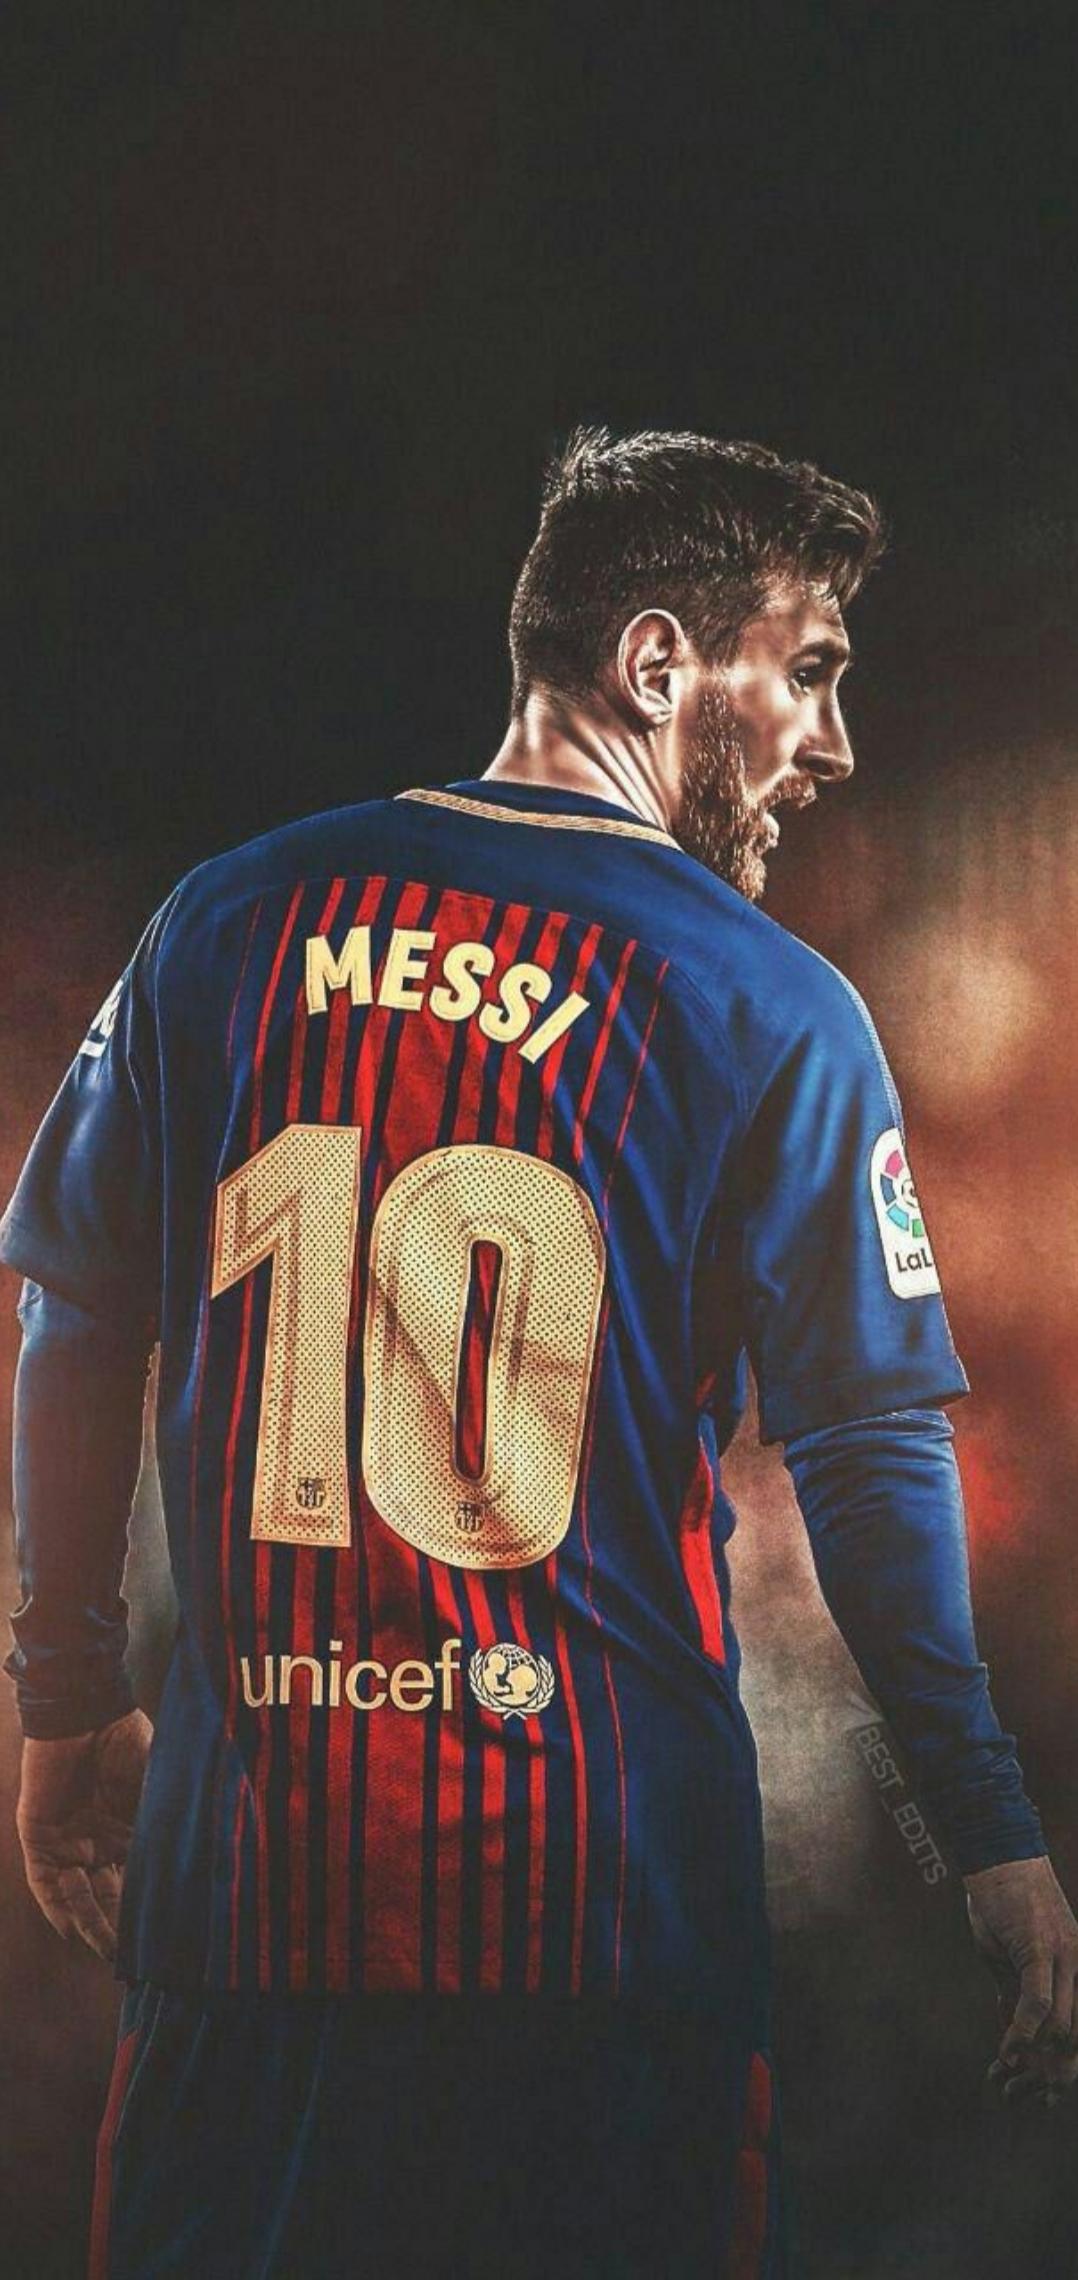 Lionel Messi Wallpaper - Iphone Messi Wallpaper Hd , HD Wallpaper & Backgrounds